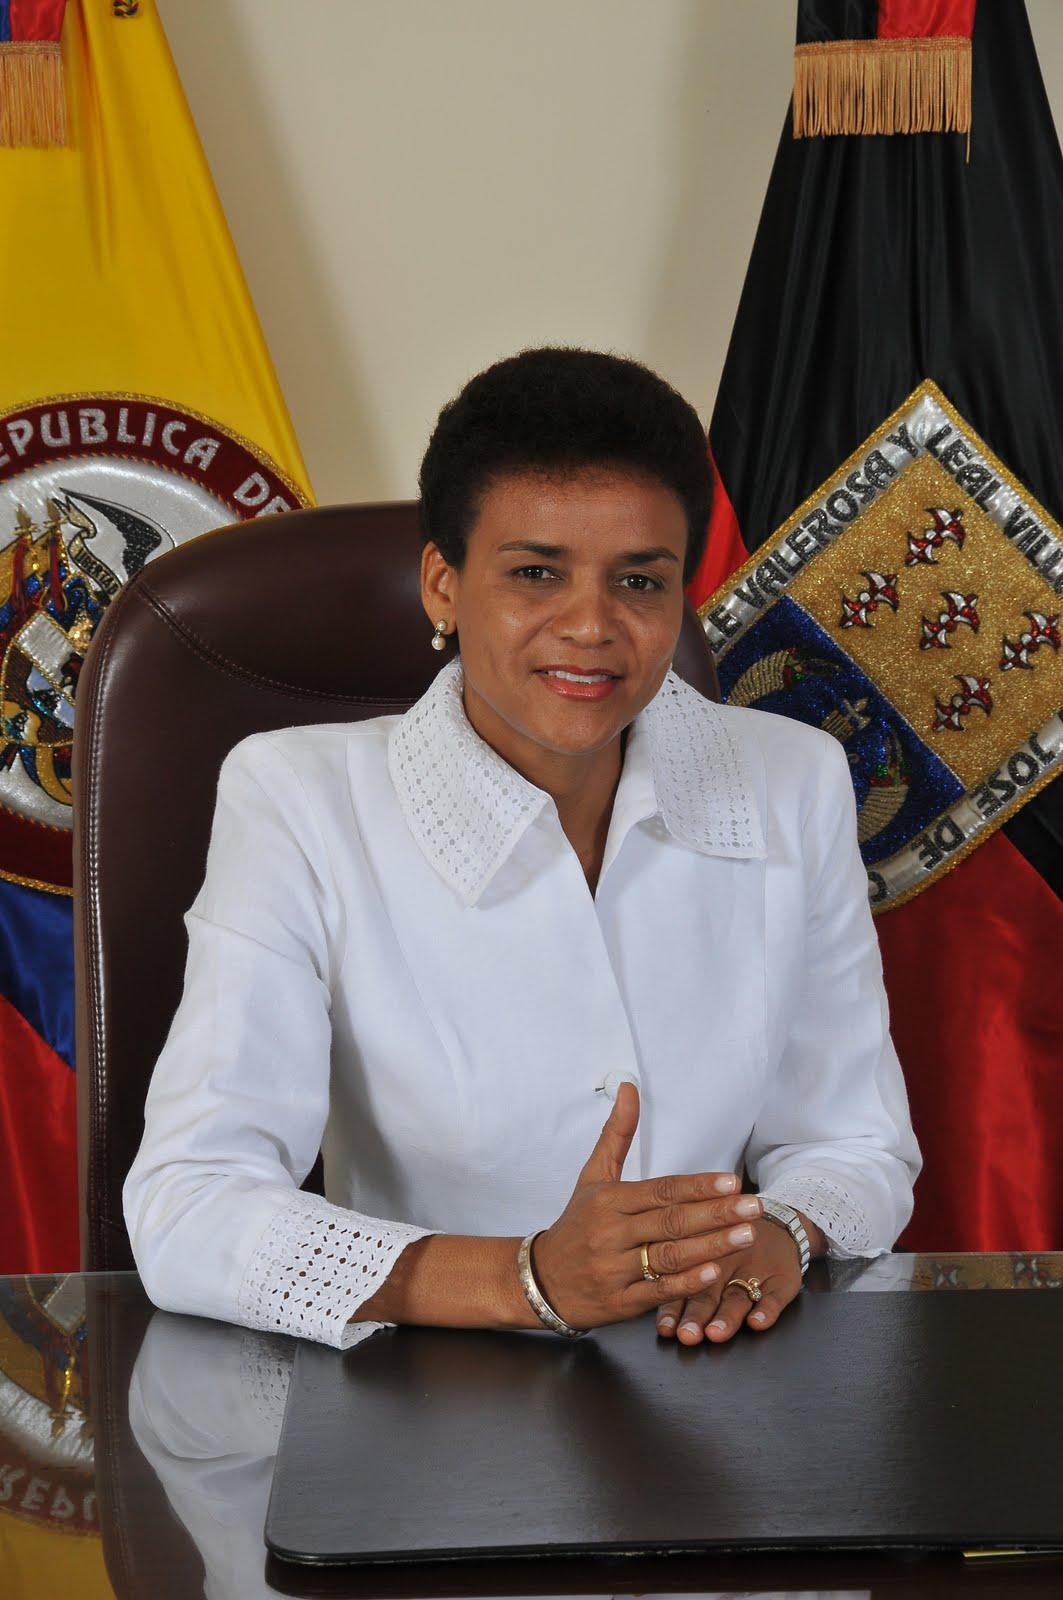 Dra. María Eugenia Riascos Rodríguez